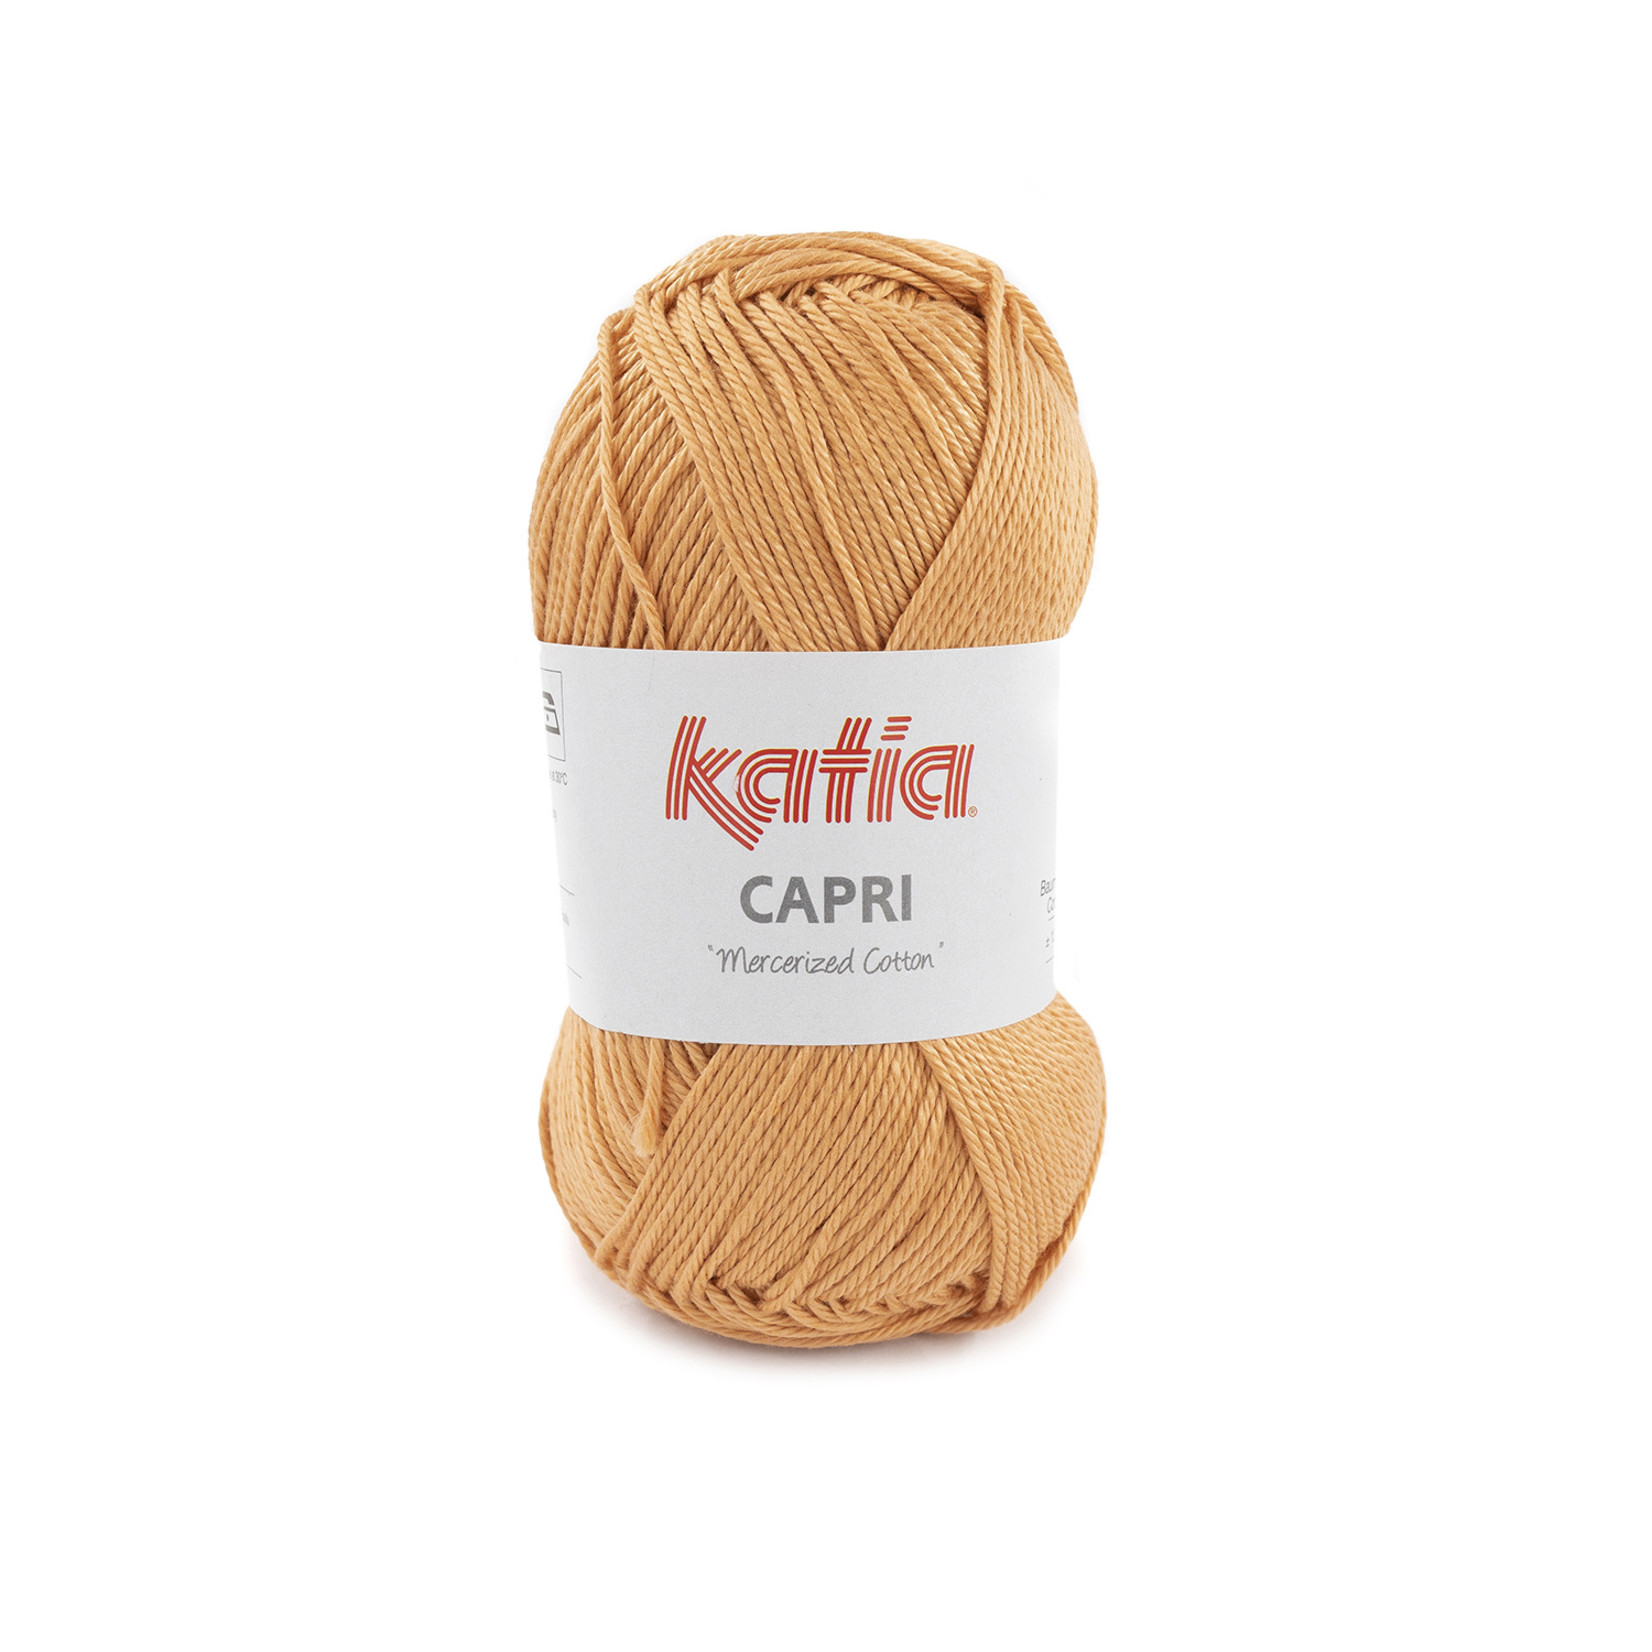 Katia Katia Capri - kleur 181 onbekend - 50 gr. = 125 m. - 100% katoen